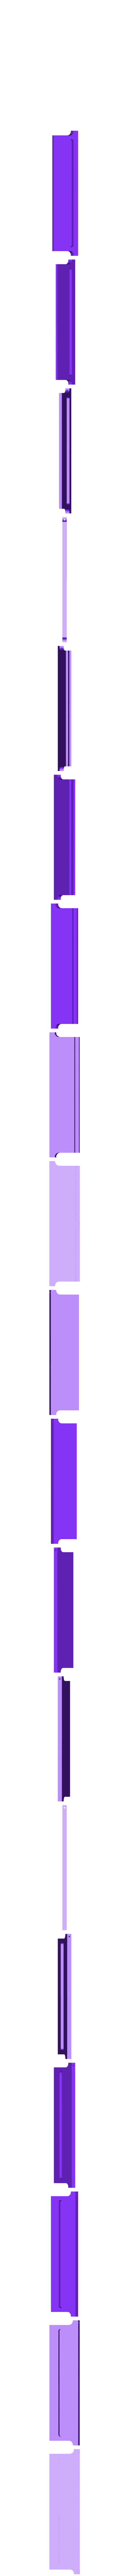 top_door_centered_smooth_LT.stl Télécharger fichier STL gratuit Ghostbuster Ghostbuster Ghosttrap • Modèle pour impression 3D, SLIDES